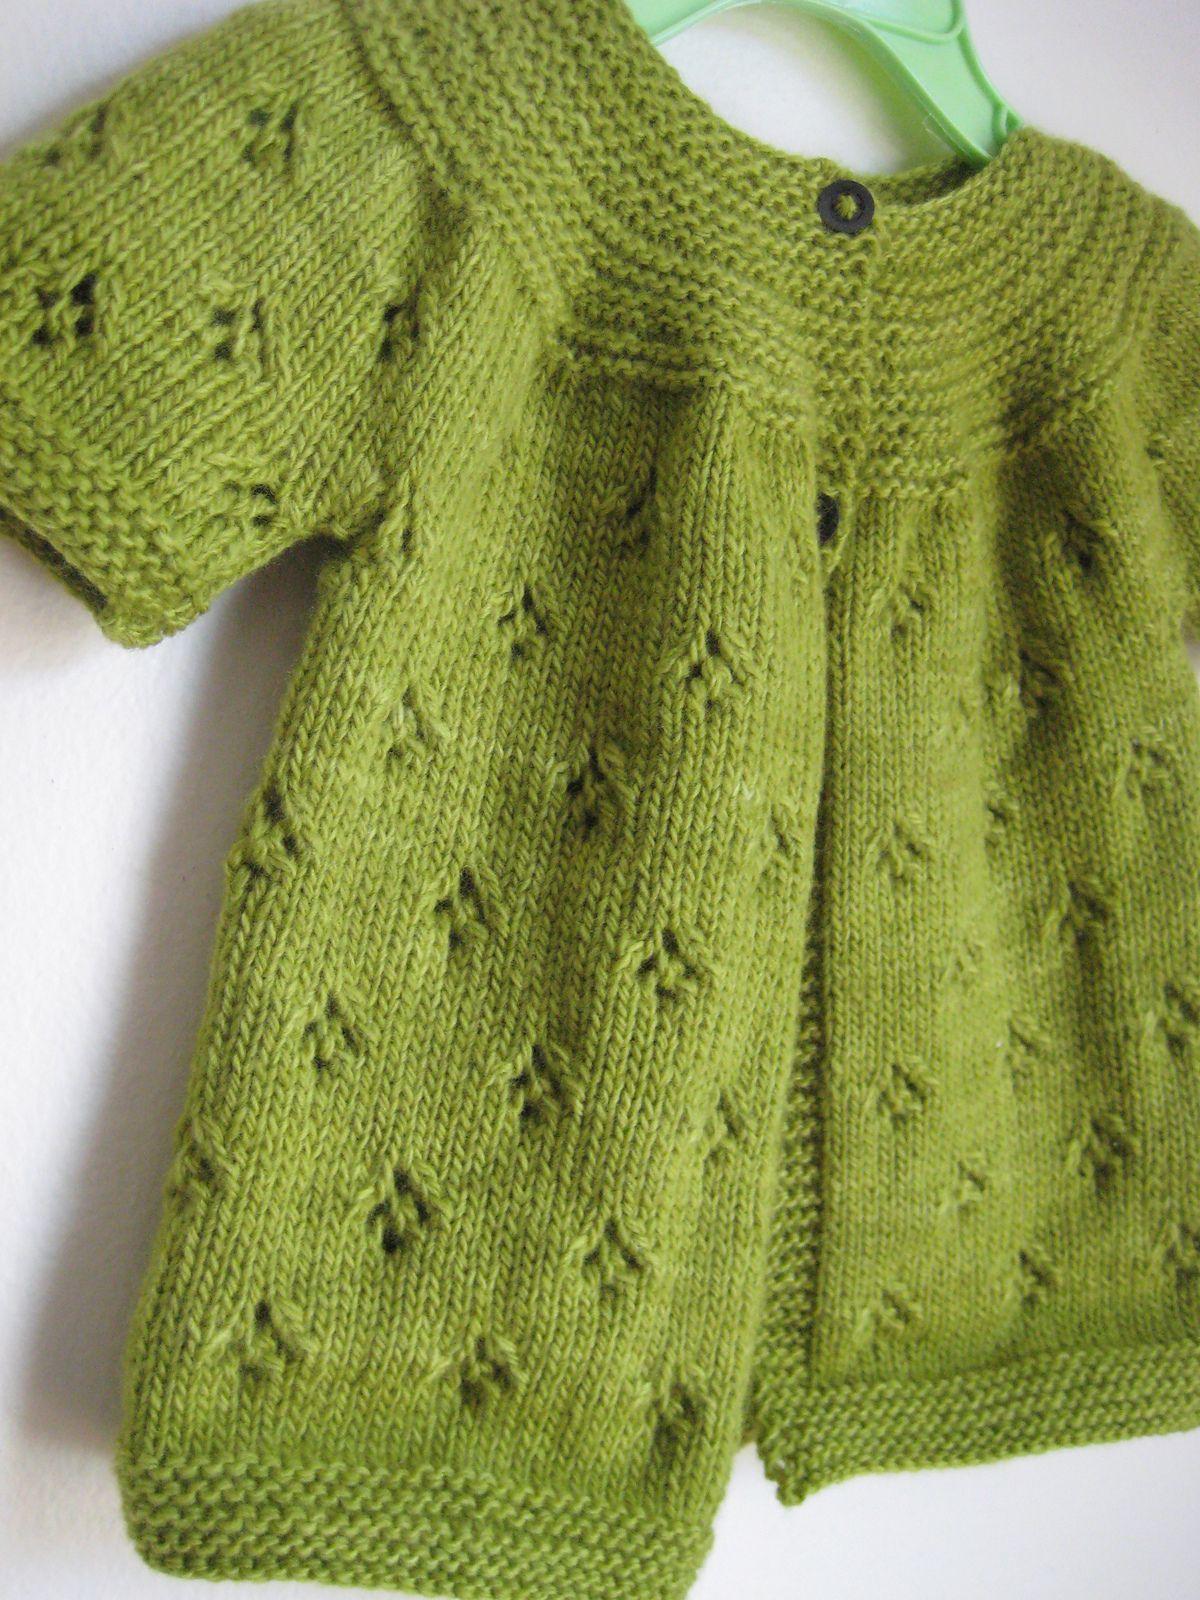 Ravelry: lila[c]loud pattern by Nadia Crétin-Léchenne | knitt and ...